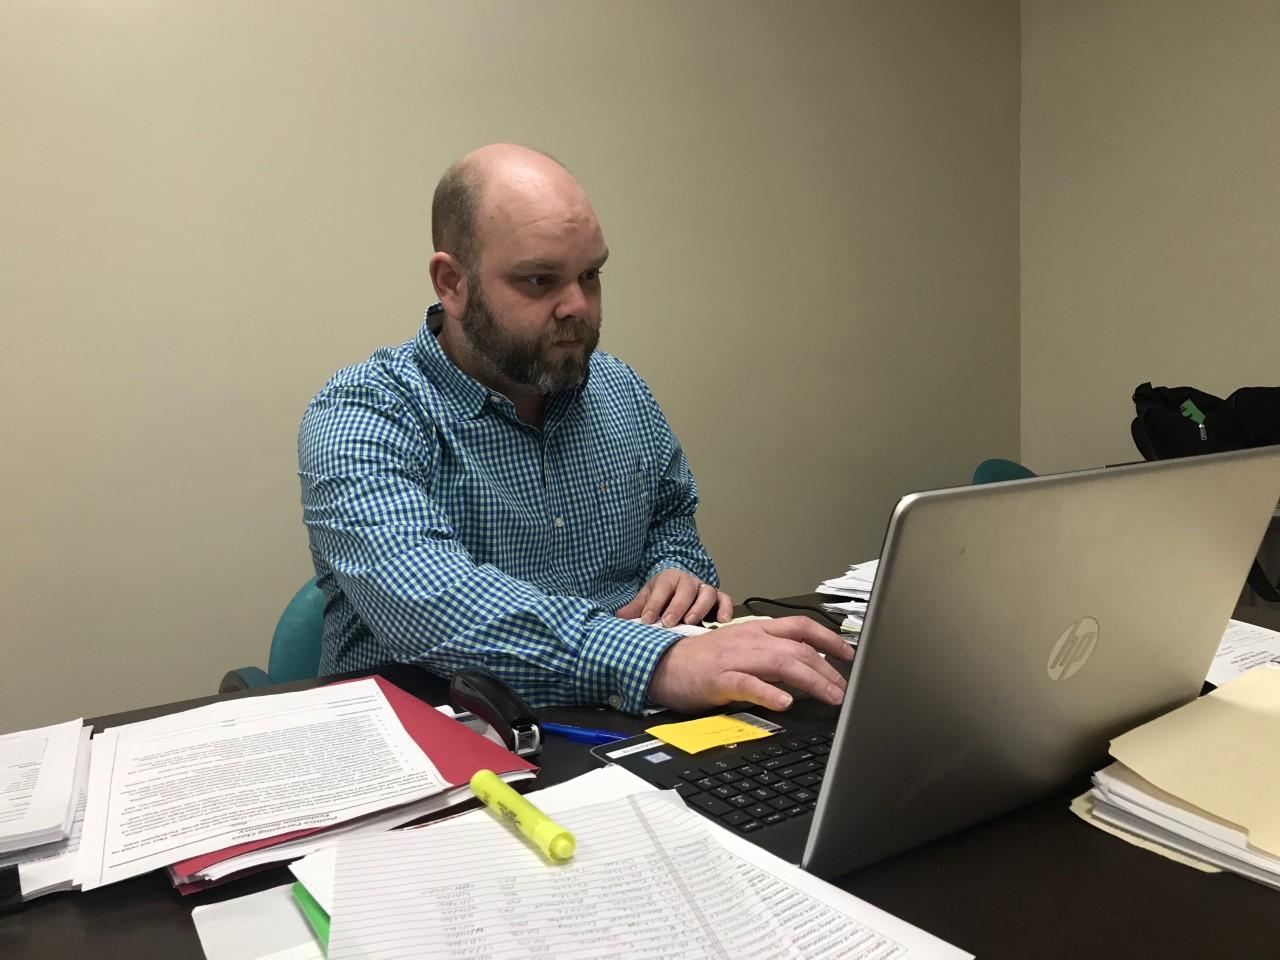 Eli Jones works on his parenting program at his desk.